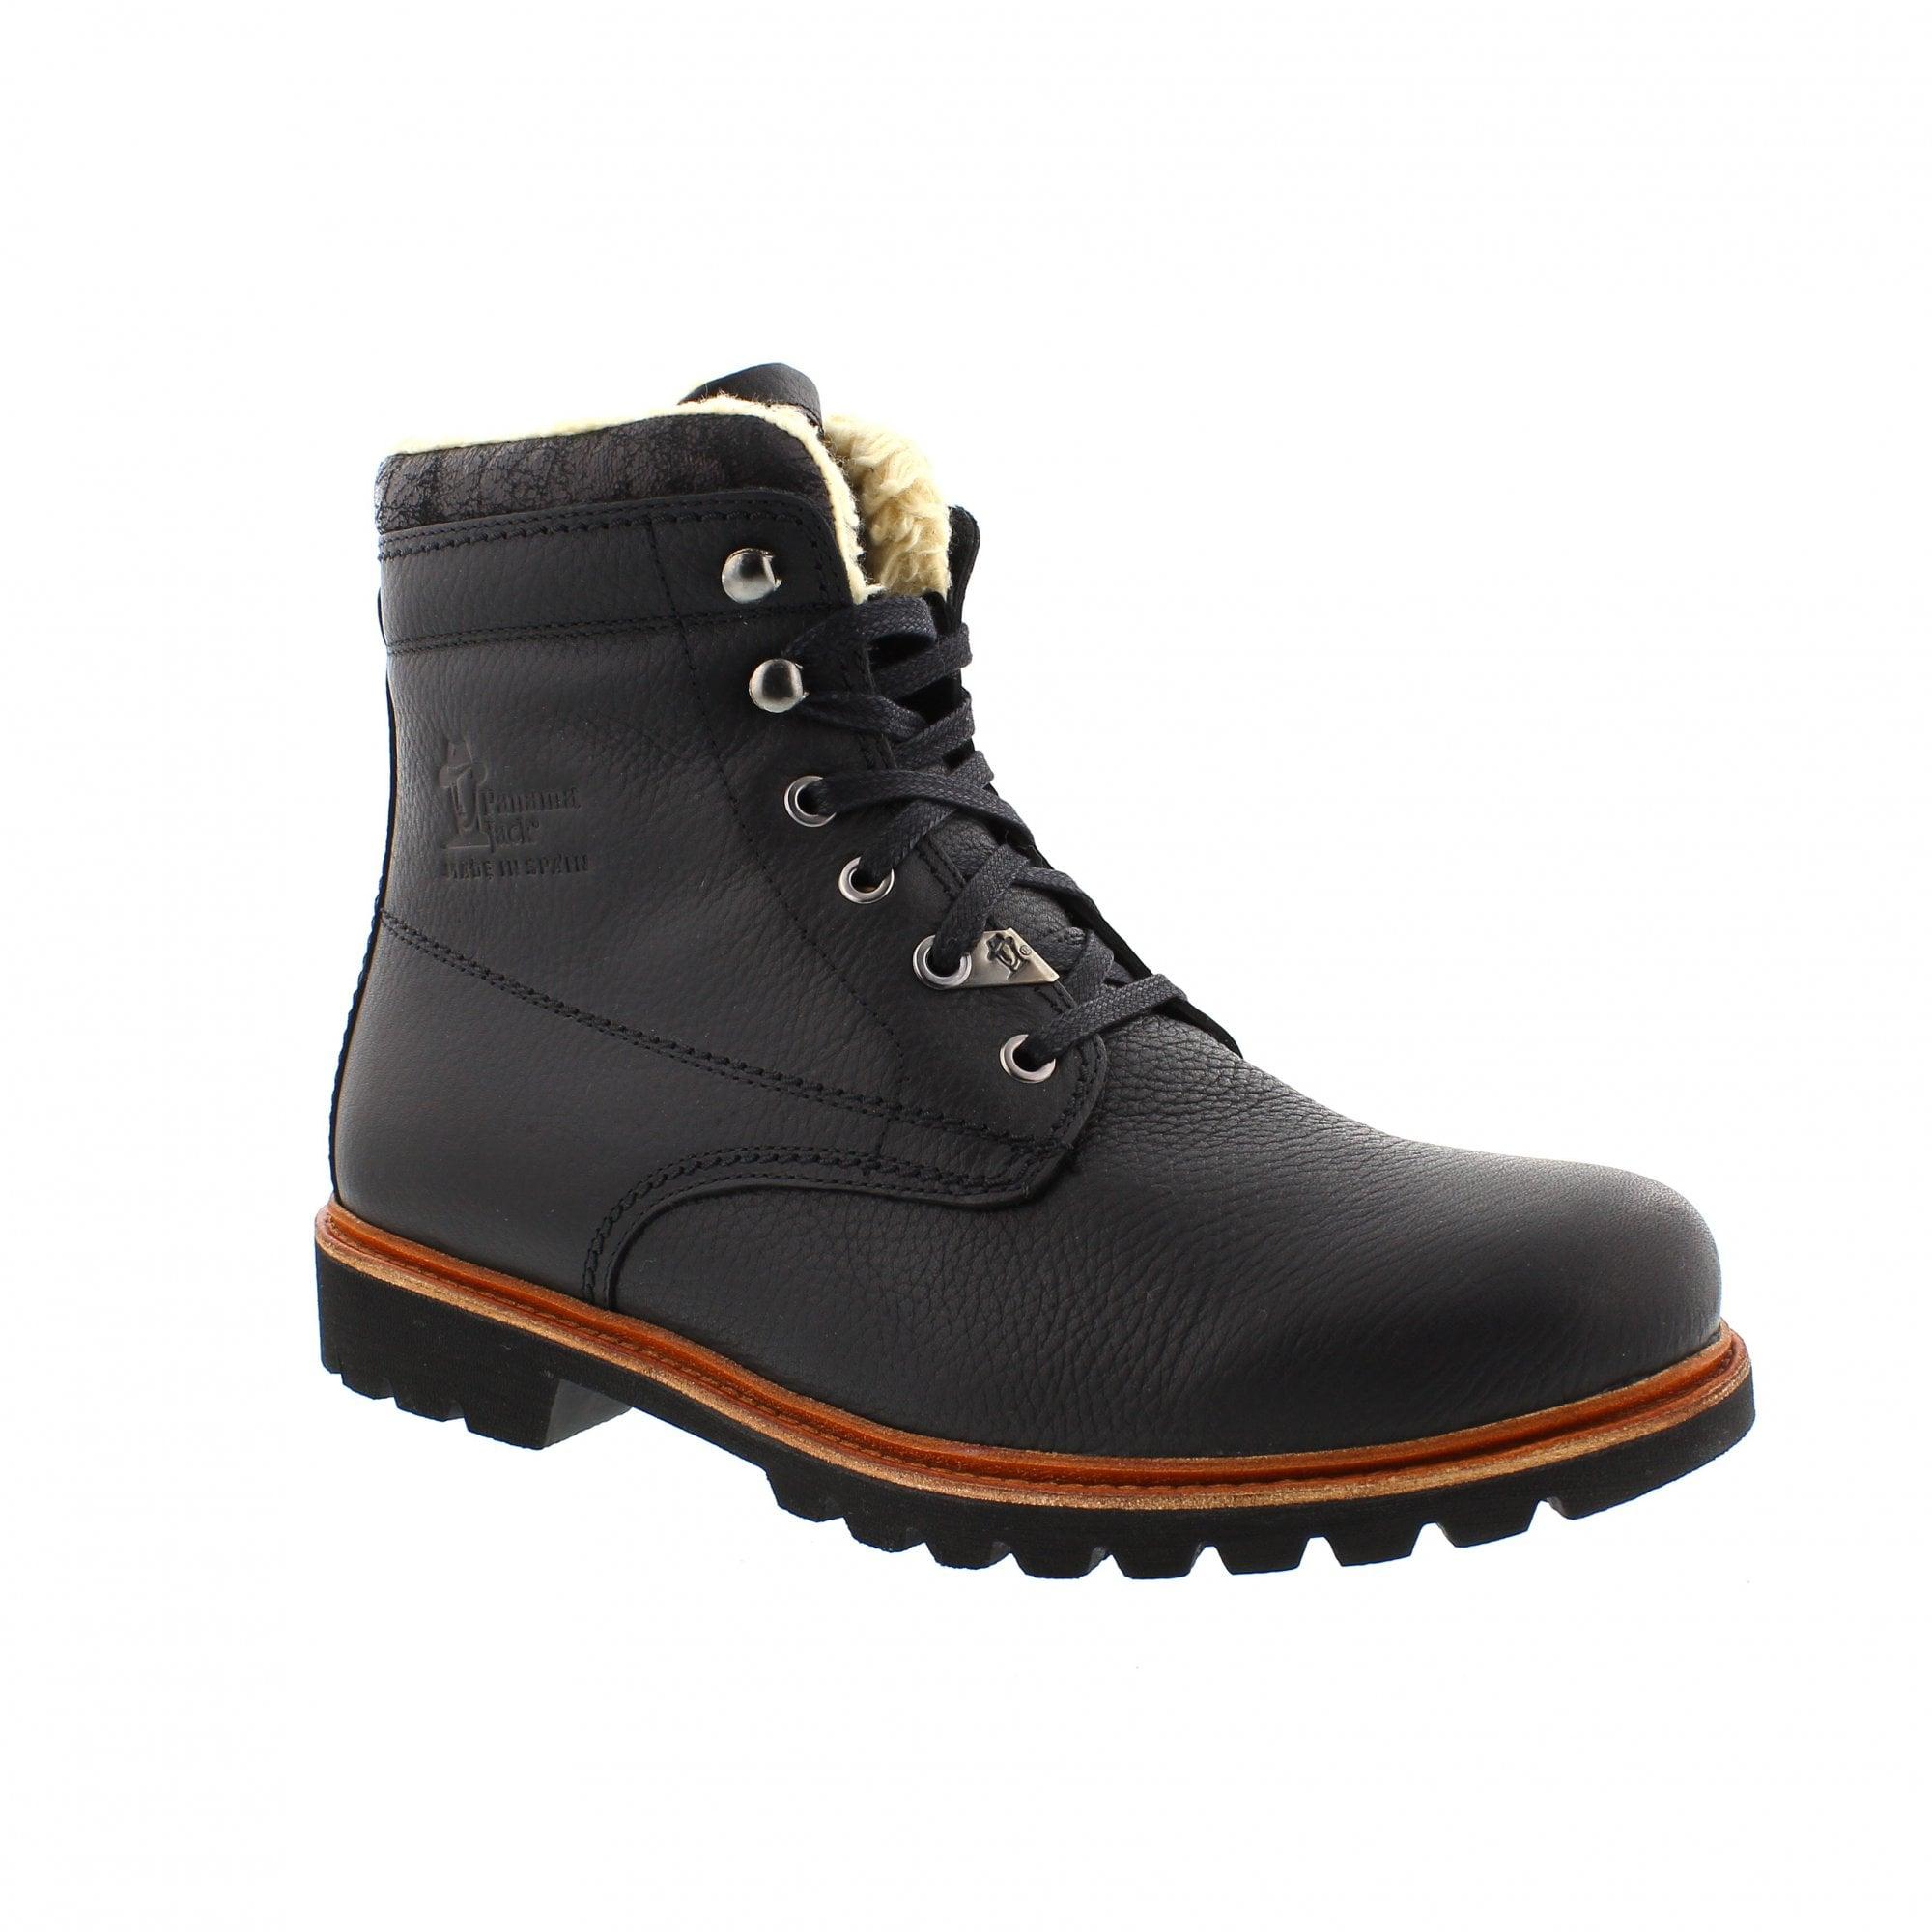 b6fe03f78ed Panama Jack 03 Aviator C2 Napa Grass Negro Black Ankle Boots